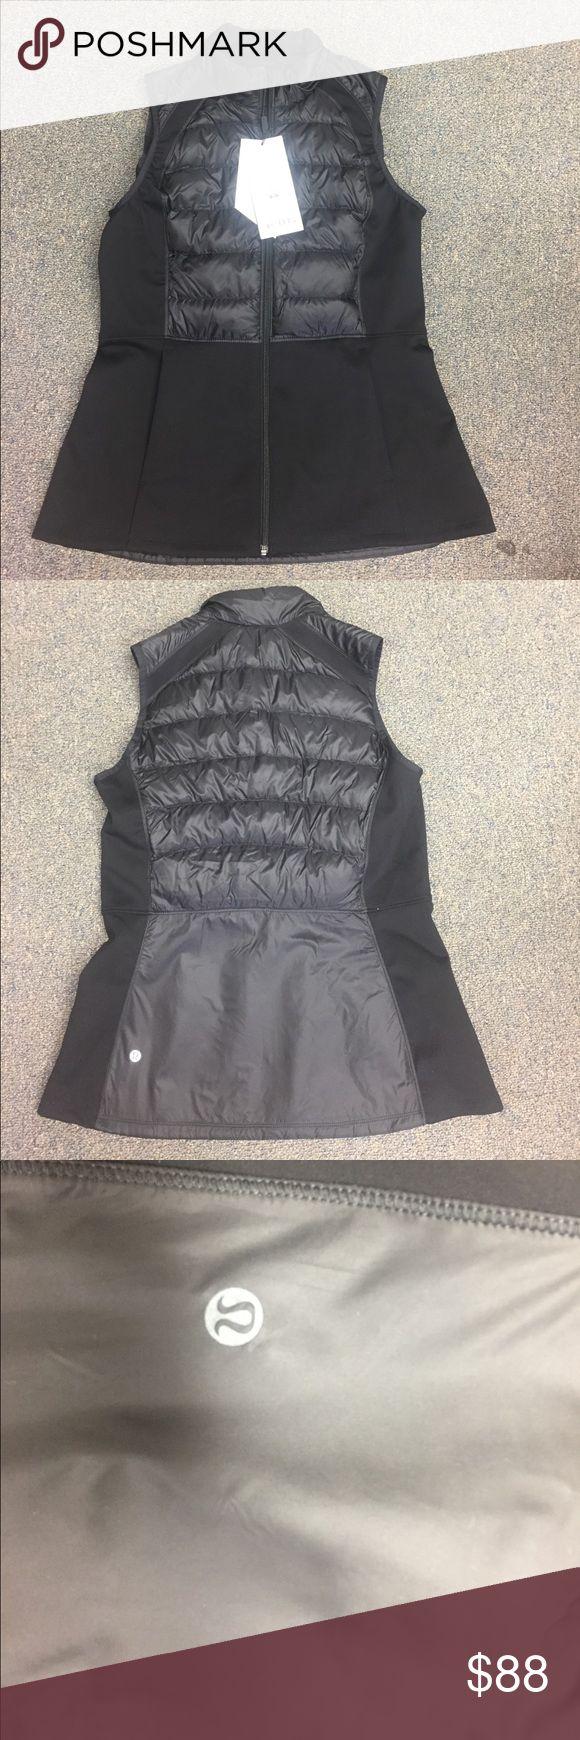 Lululemon vests brand new super cute! Great for cold weather work outs! lululemon athletica Jackets & Coats Vests